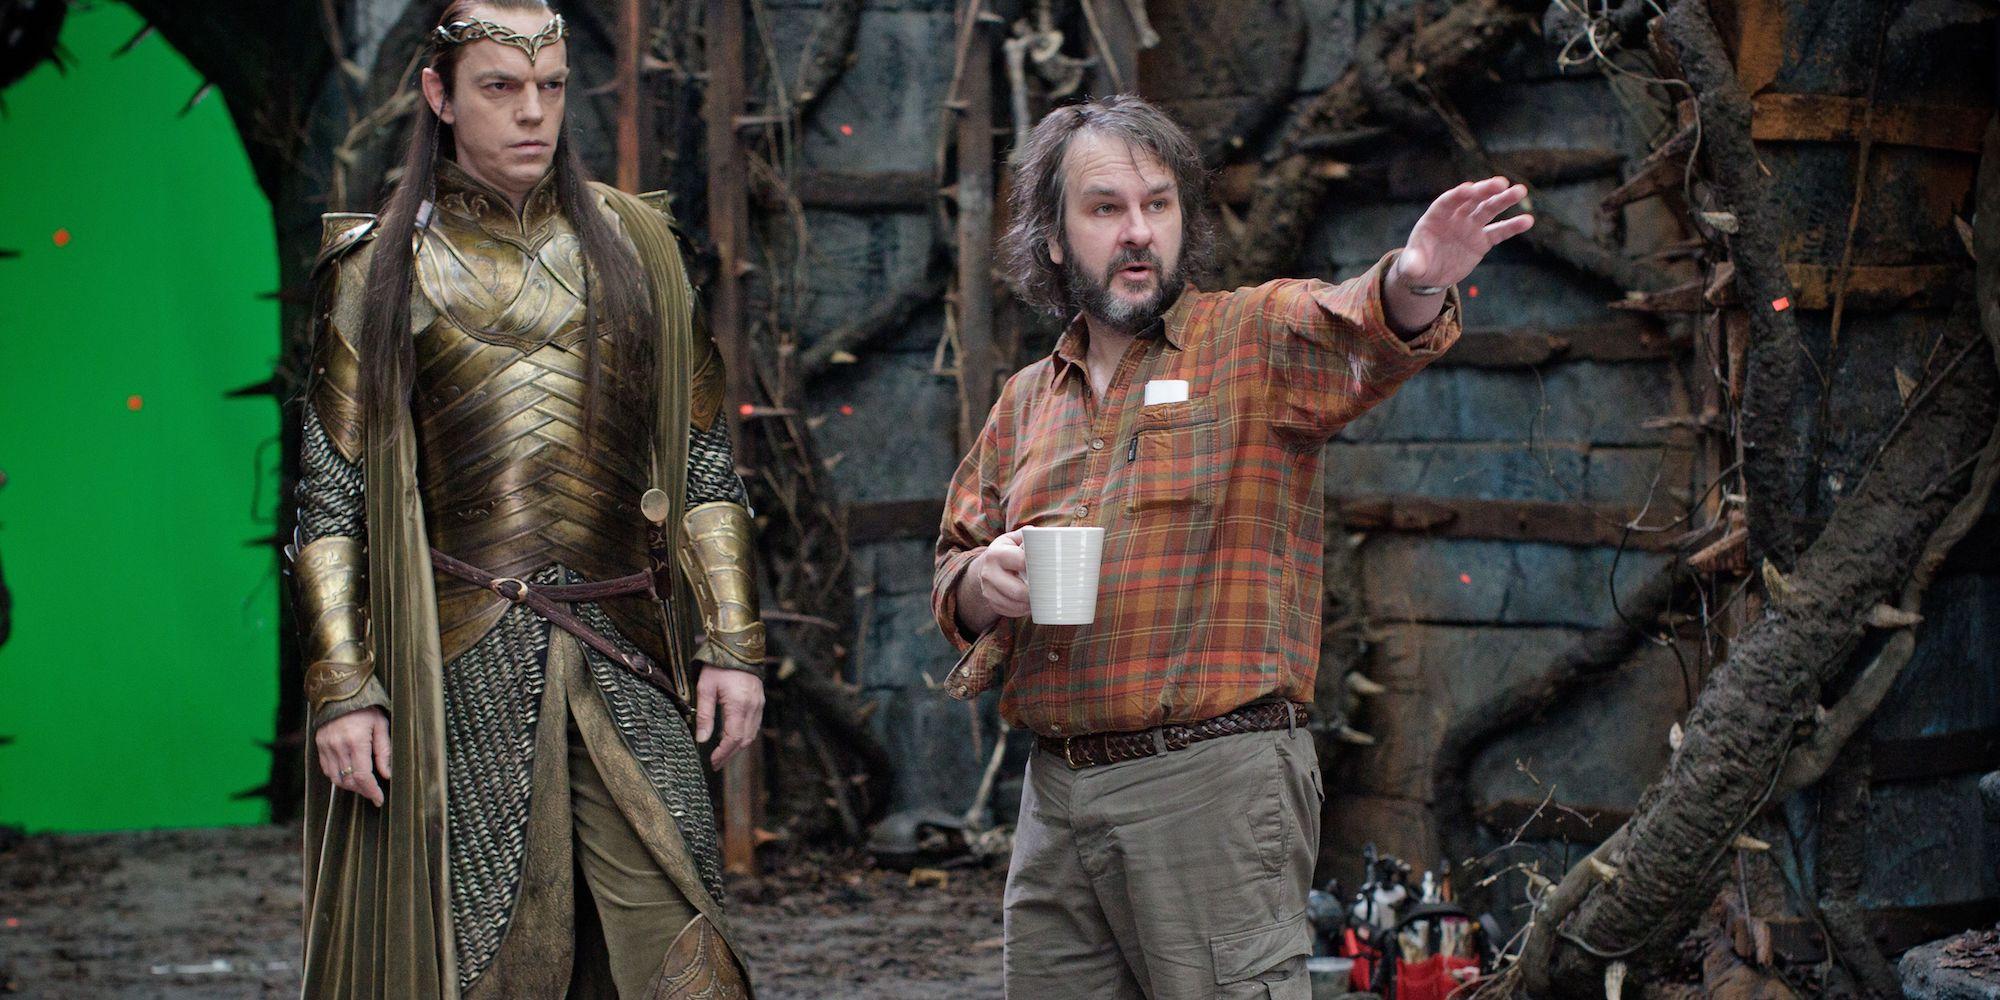 Hugo Weaving Reteams with Peter Jackson For Mortal Engines